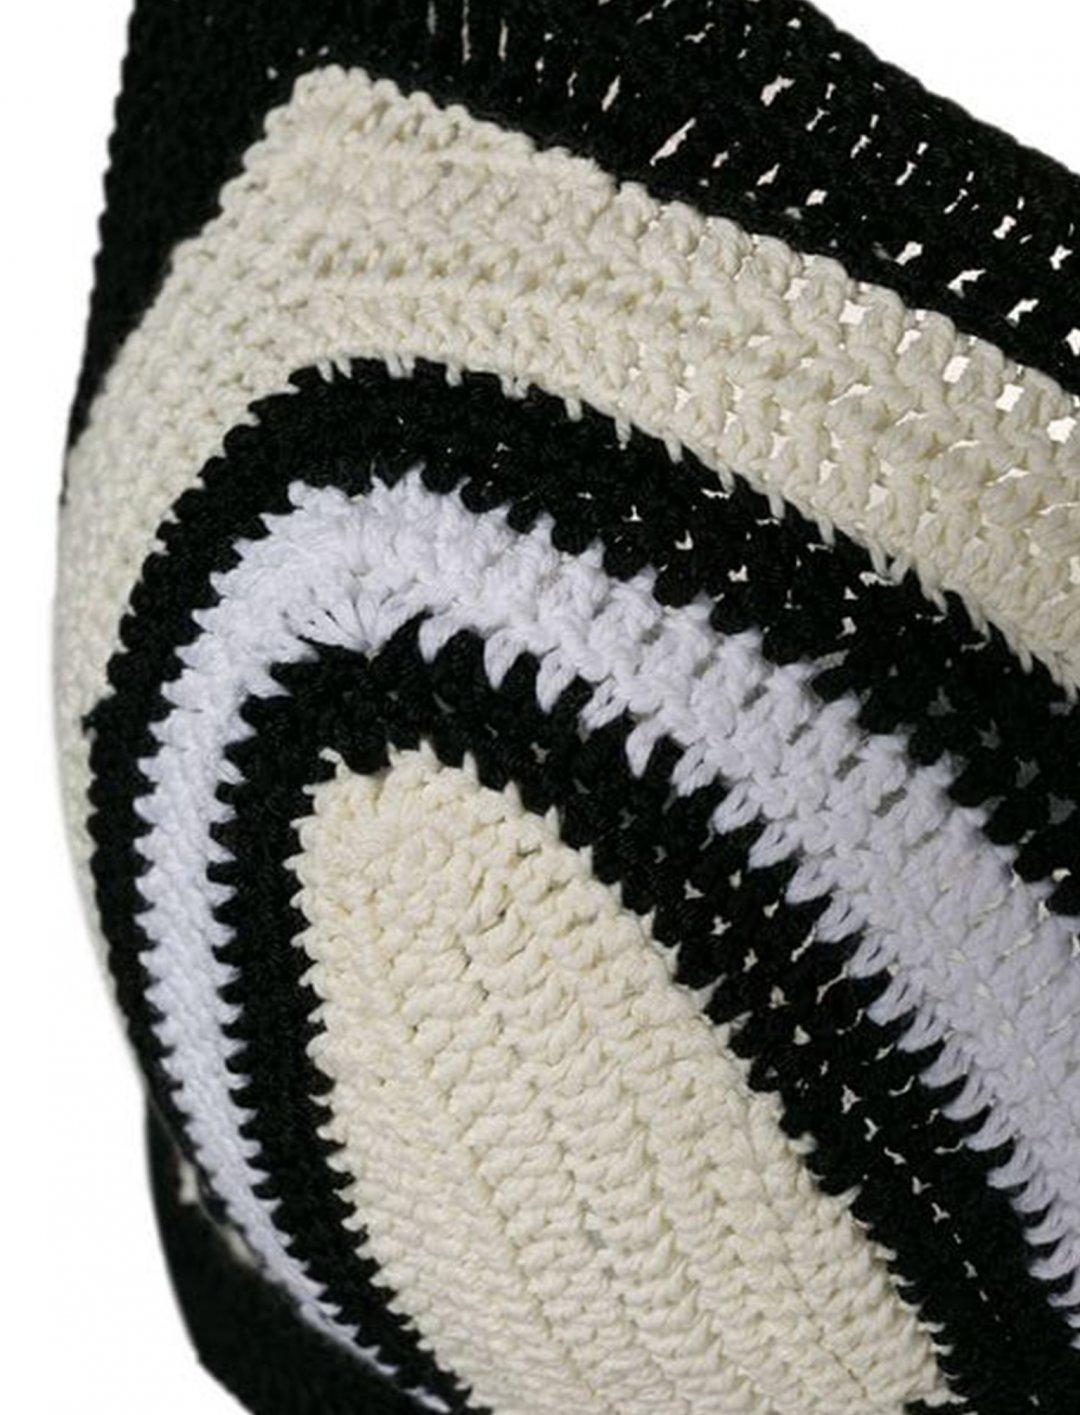 Raja Kumari's Crochet Bra Clothing Helmut Lang